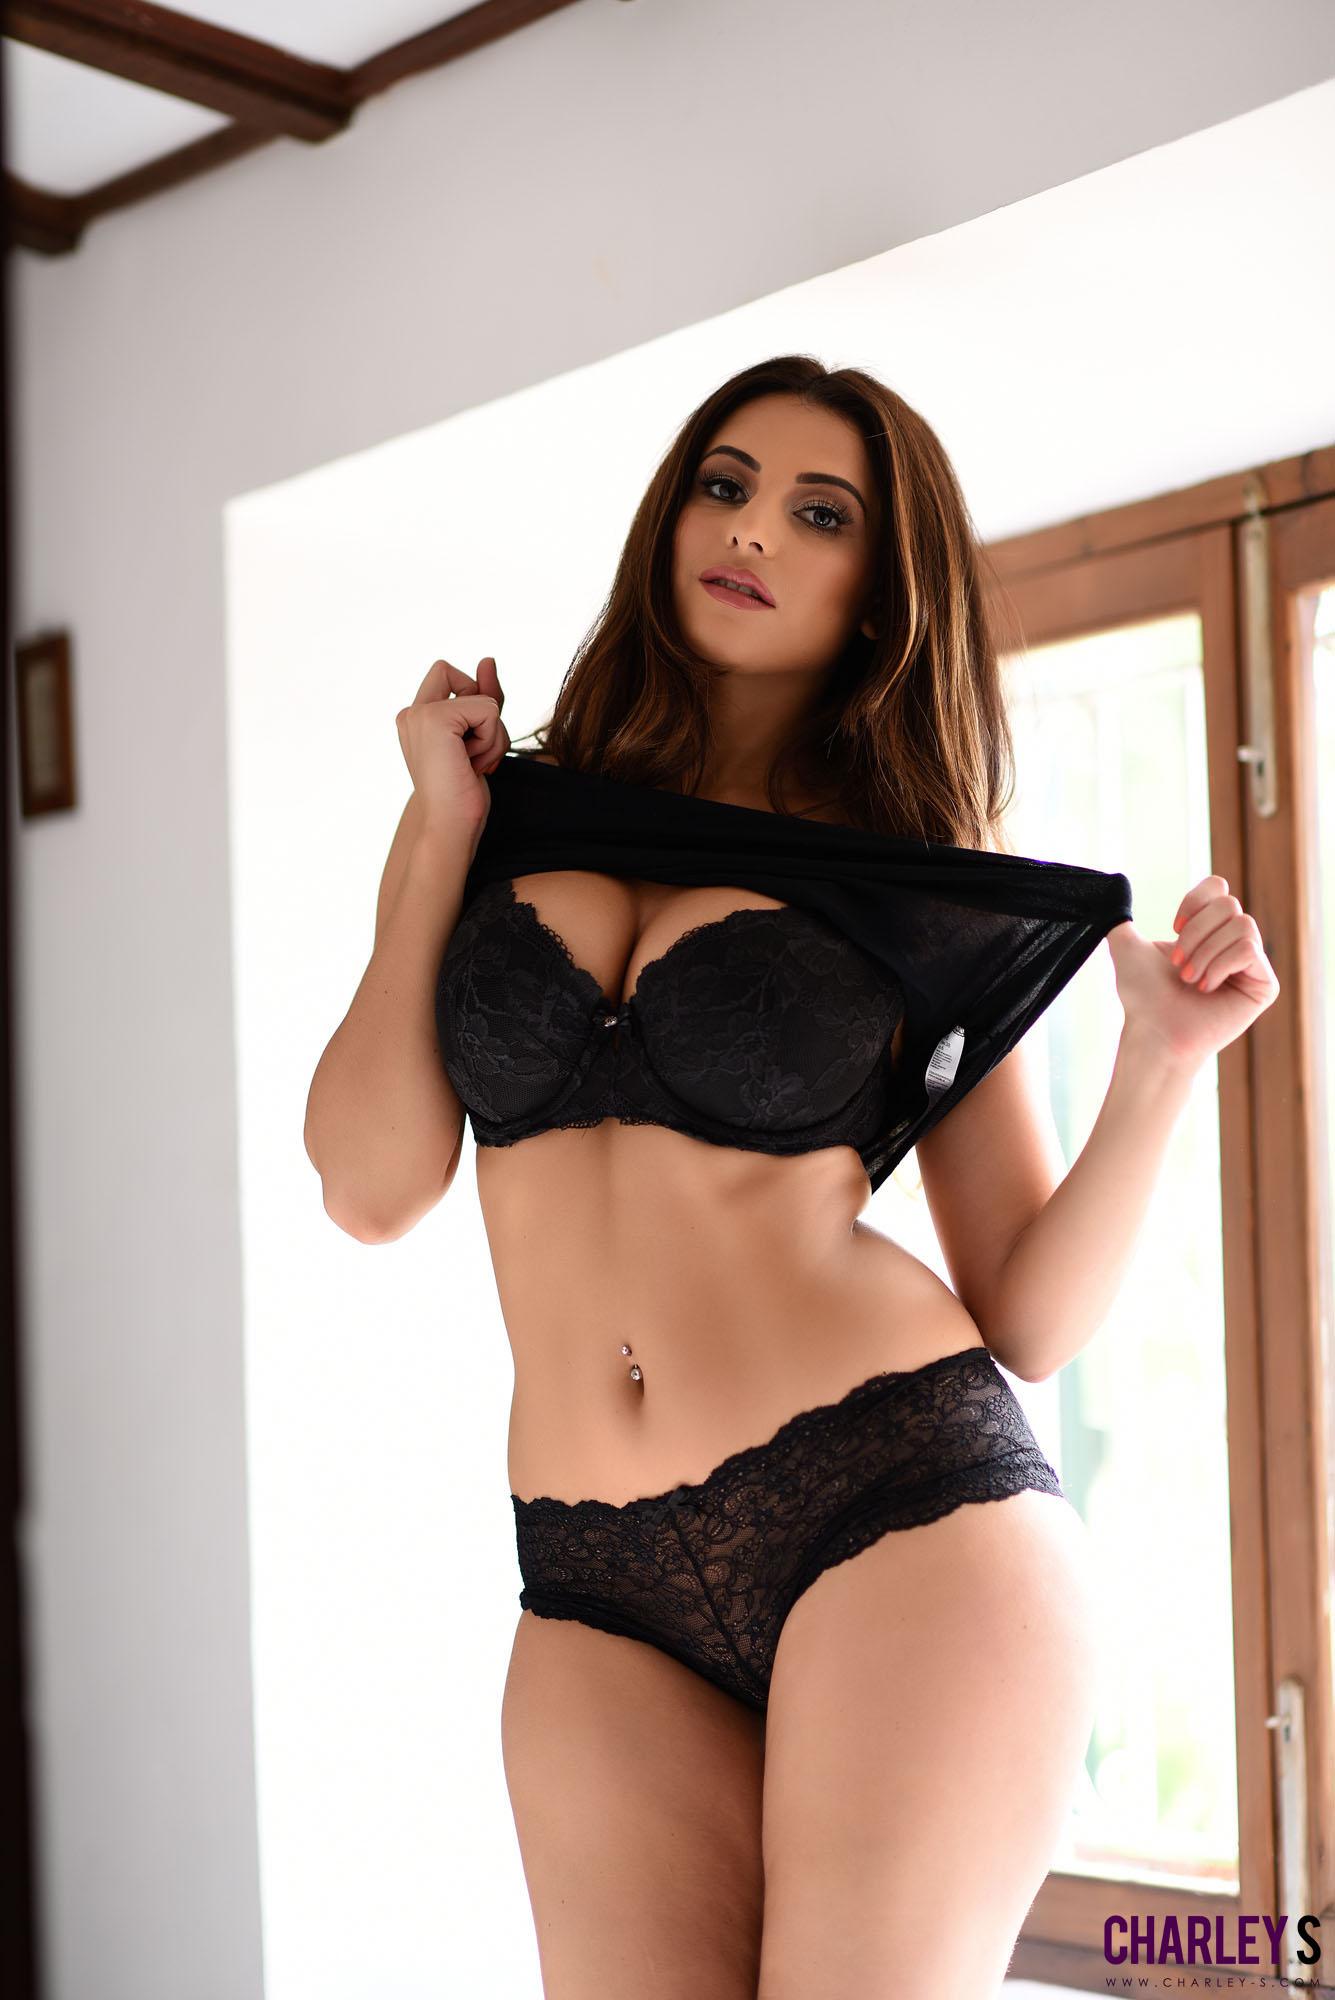 Posing in the window in nothing but her panties & top